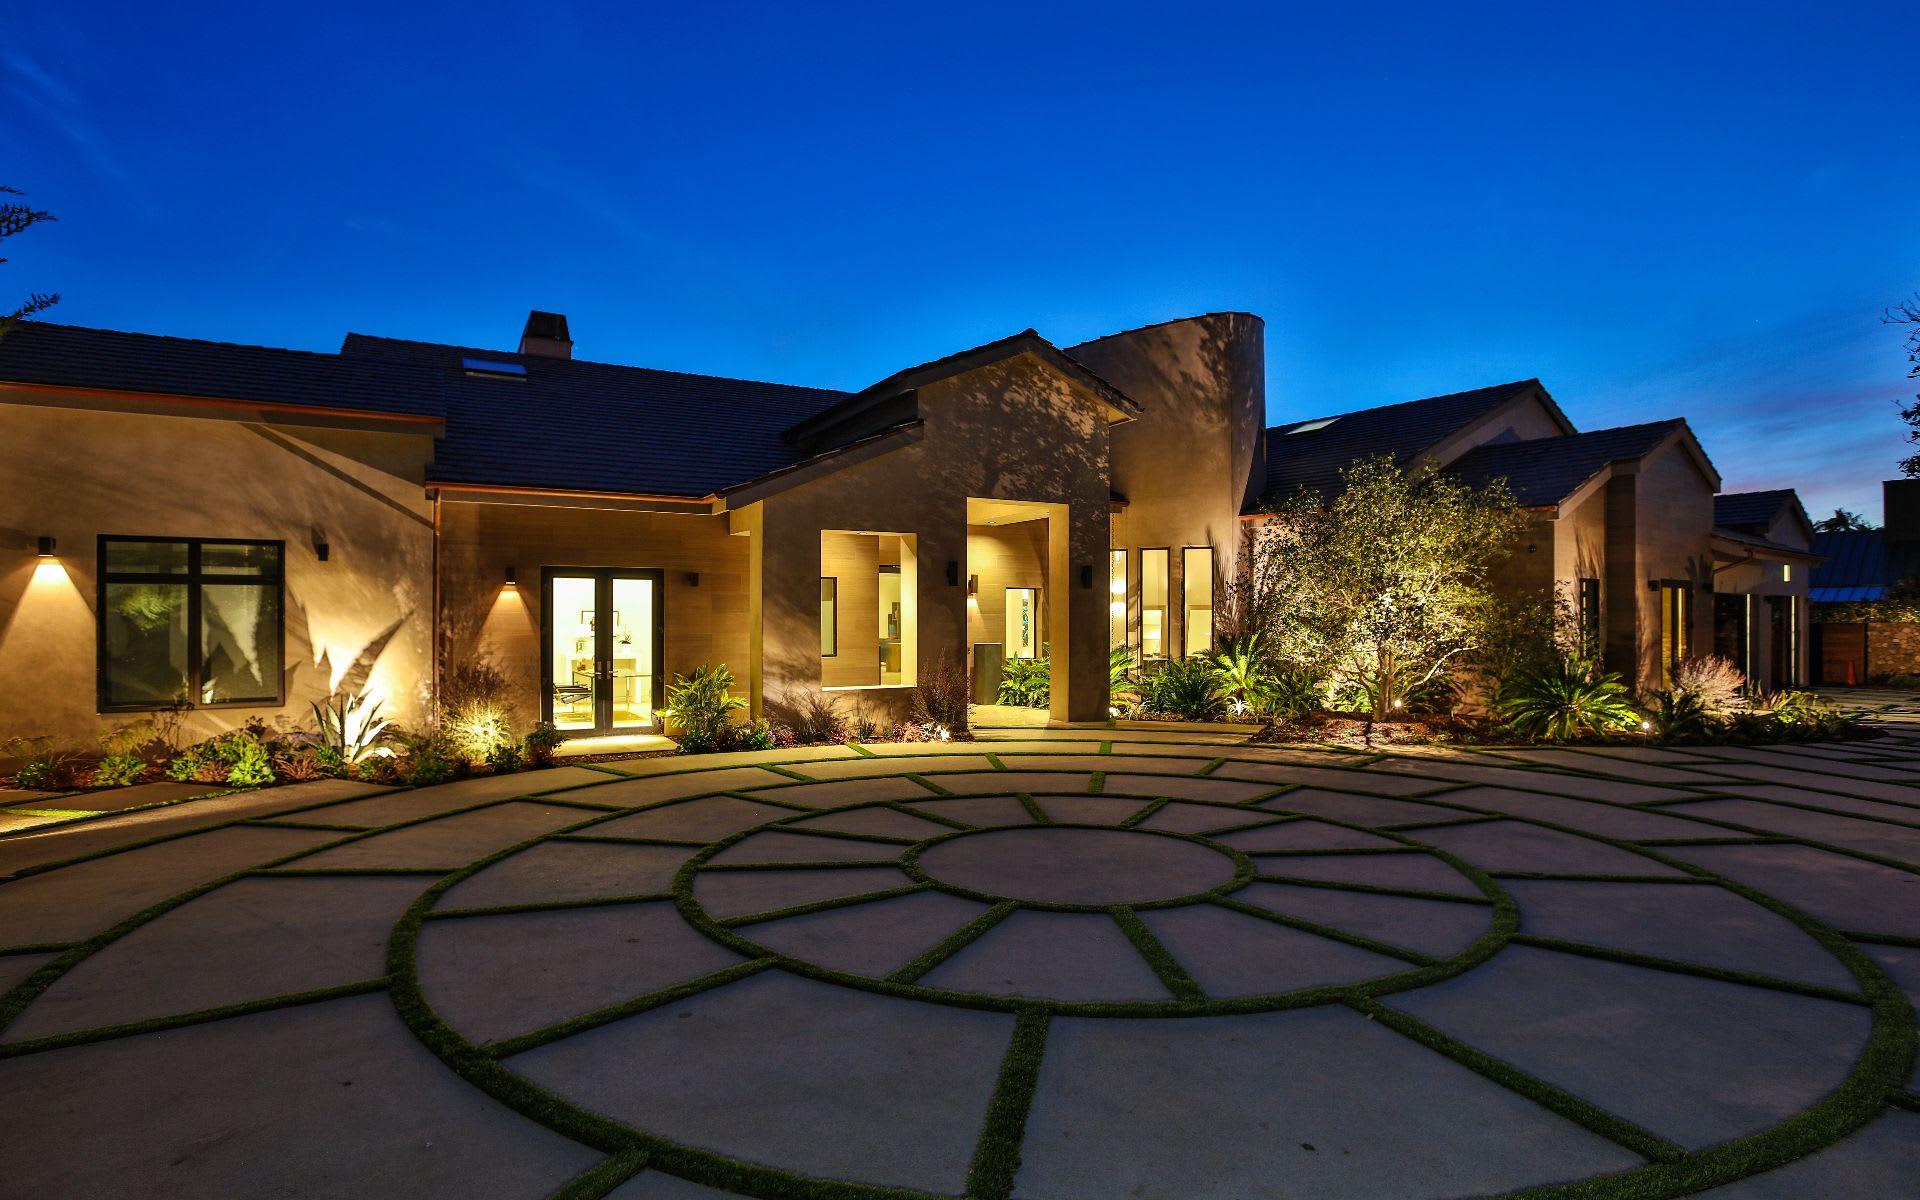 Single Family Home for Sale at 11902 Ellice St 11902 Ellice St Malibu, California,90265 United States